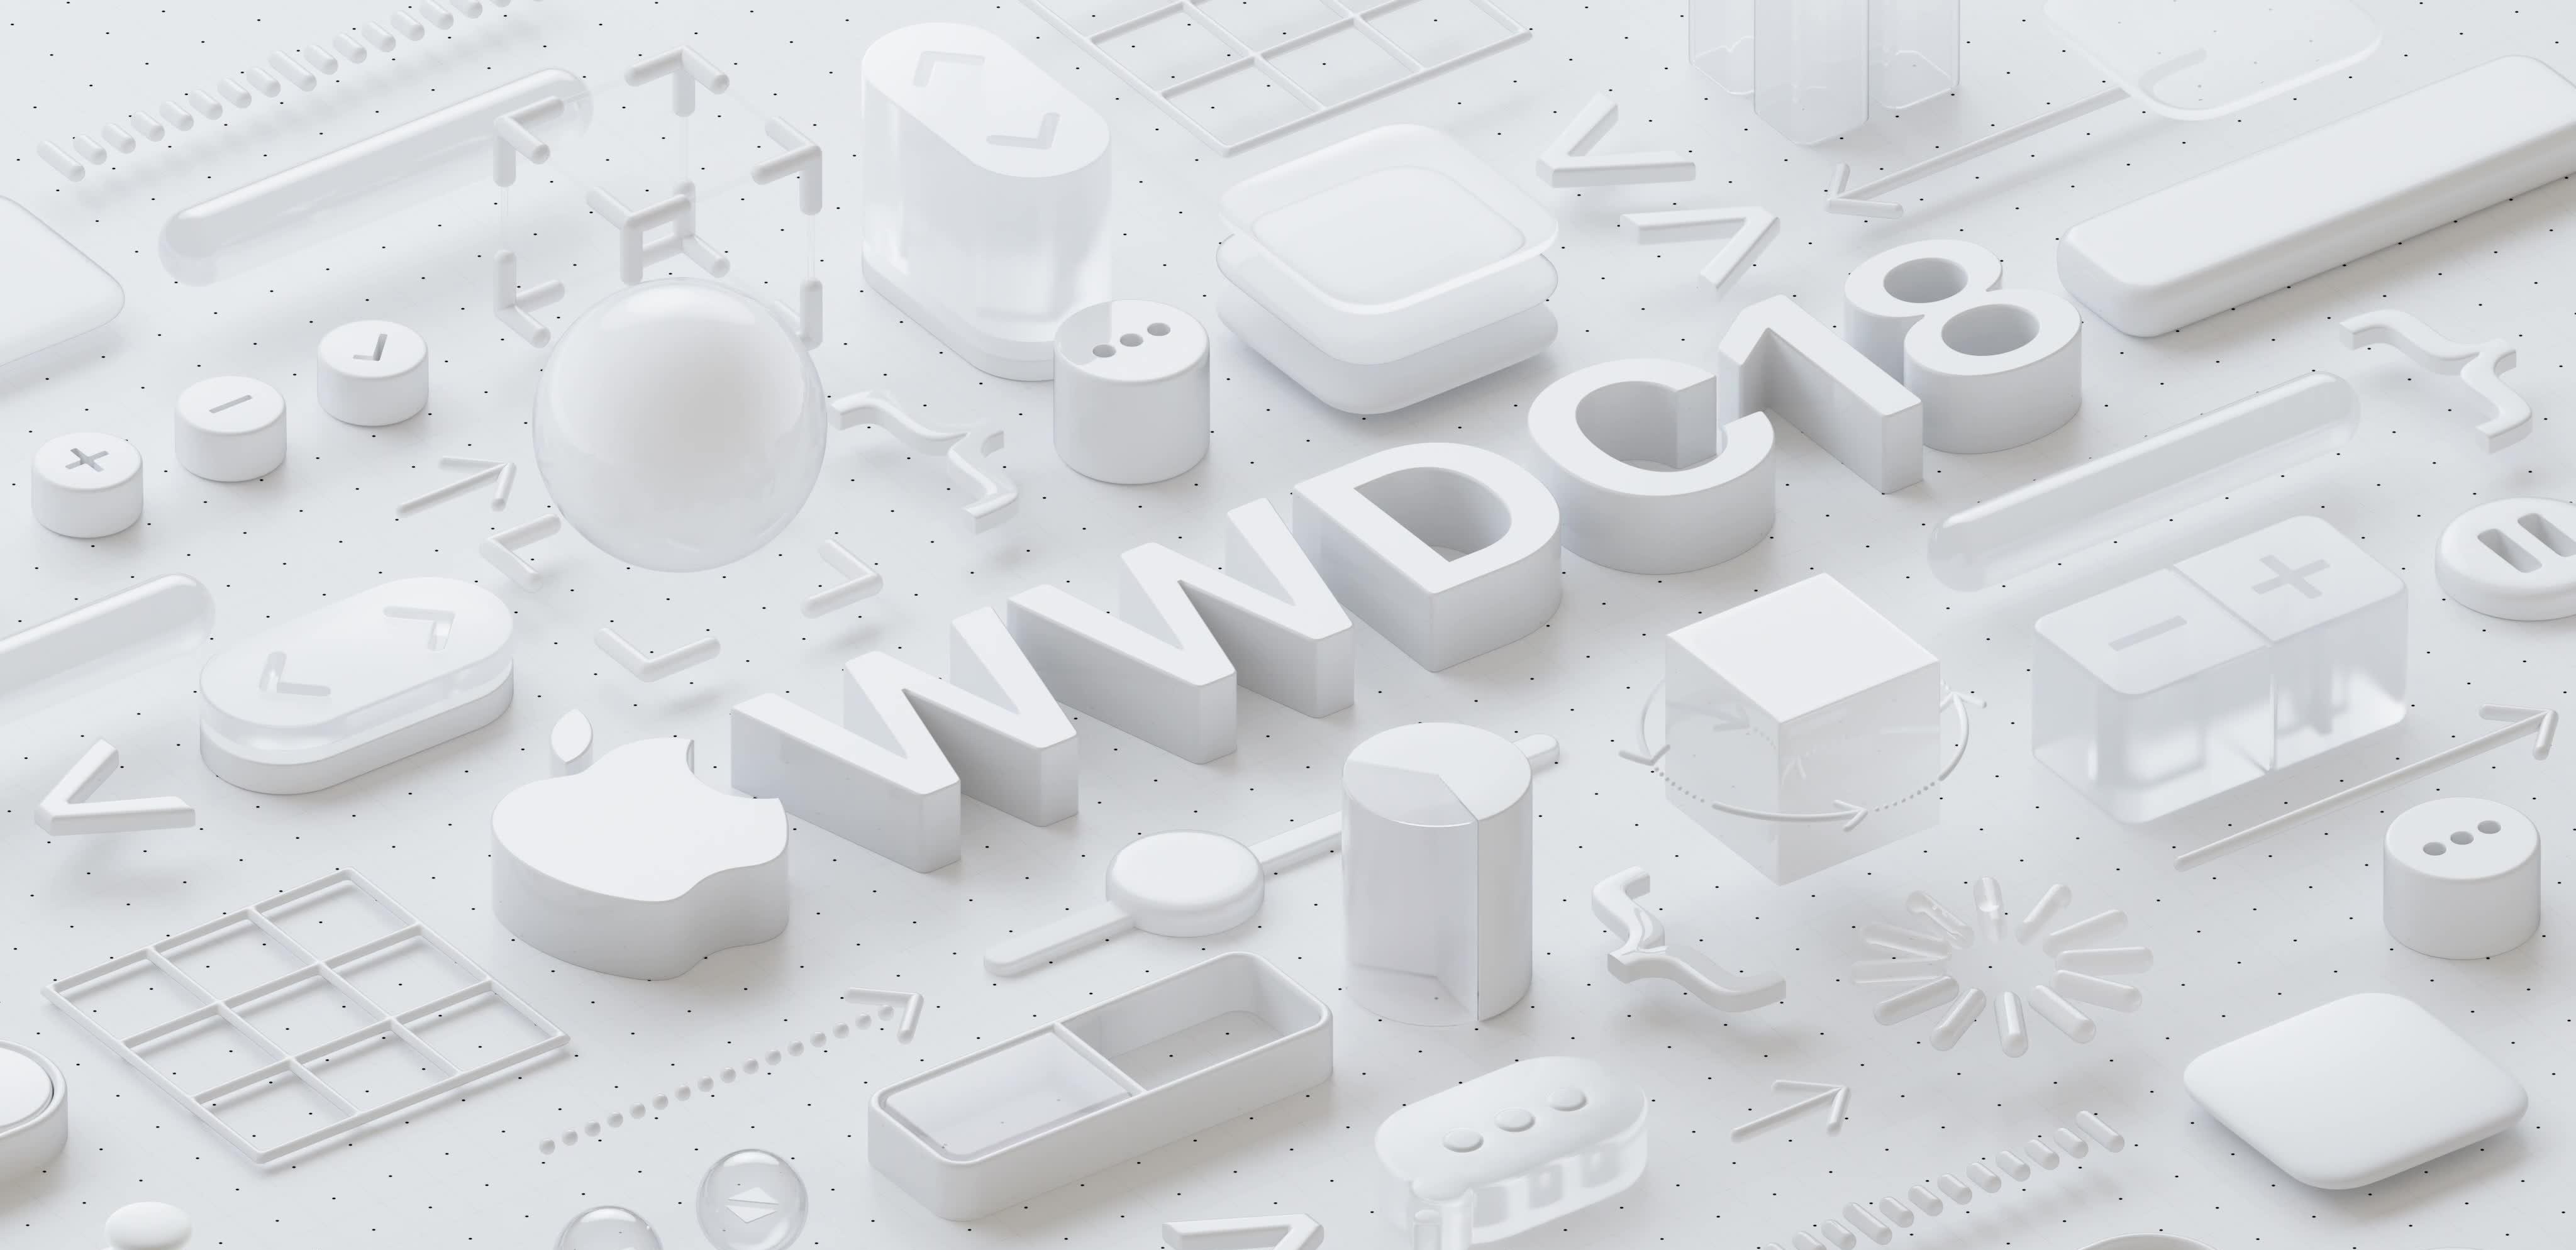 WWDC 2018 artwork